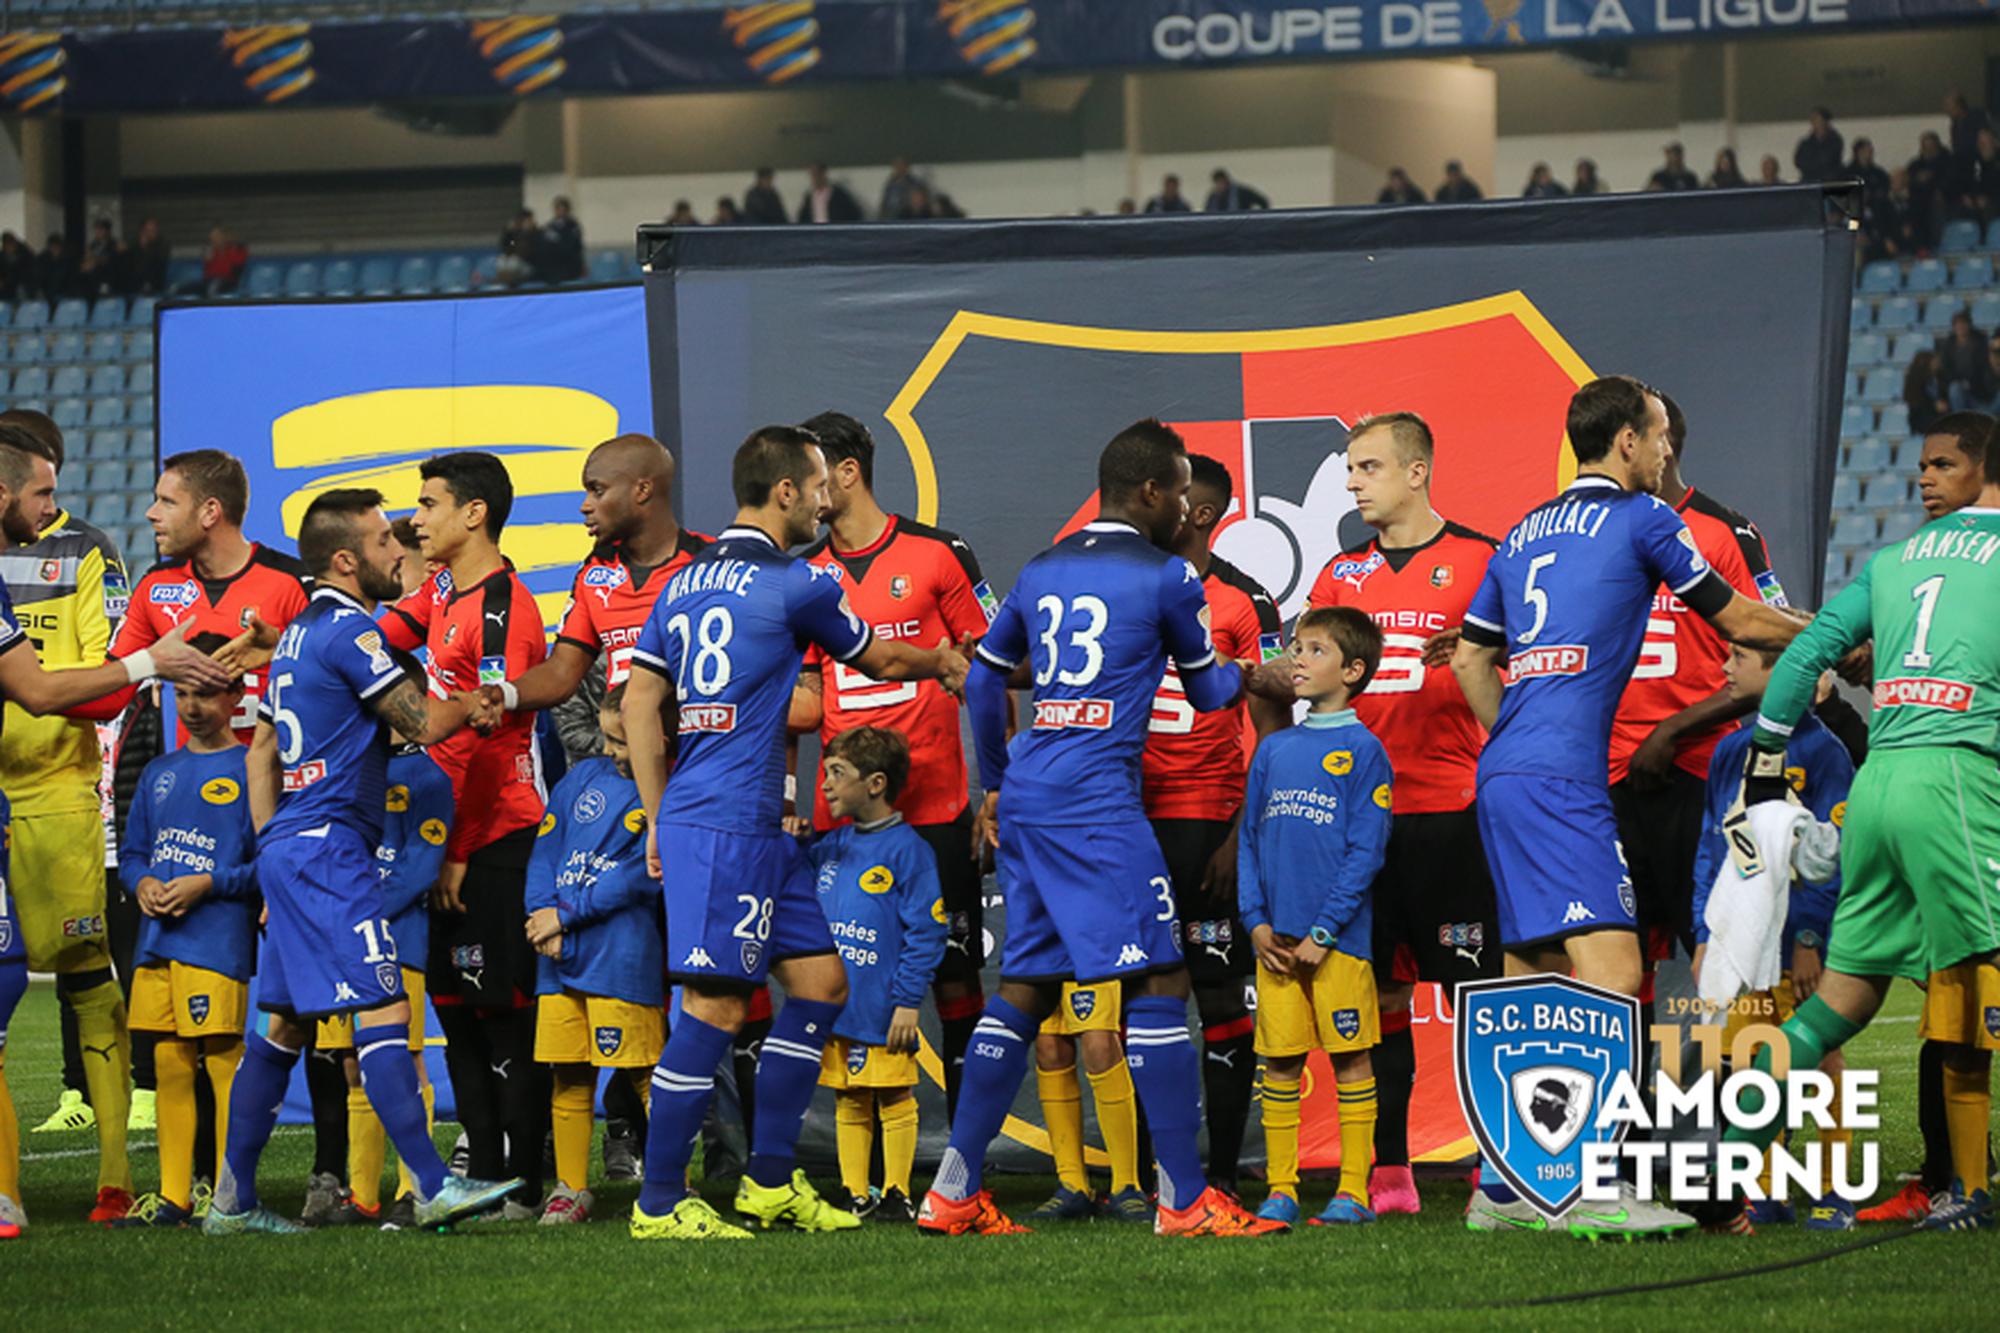 Bastia - Rennes